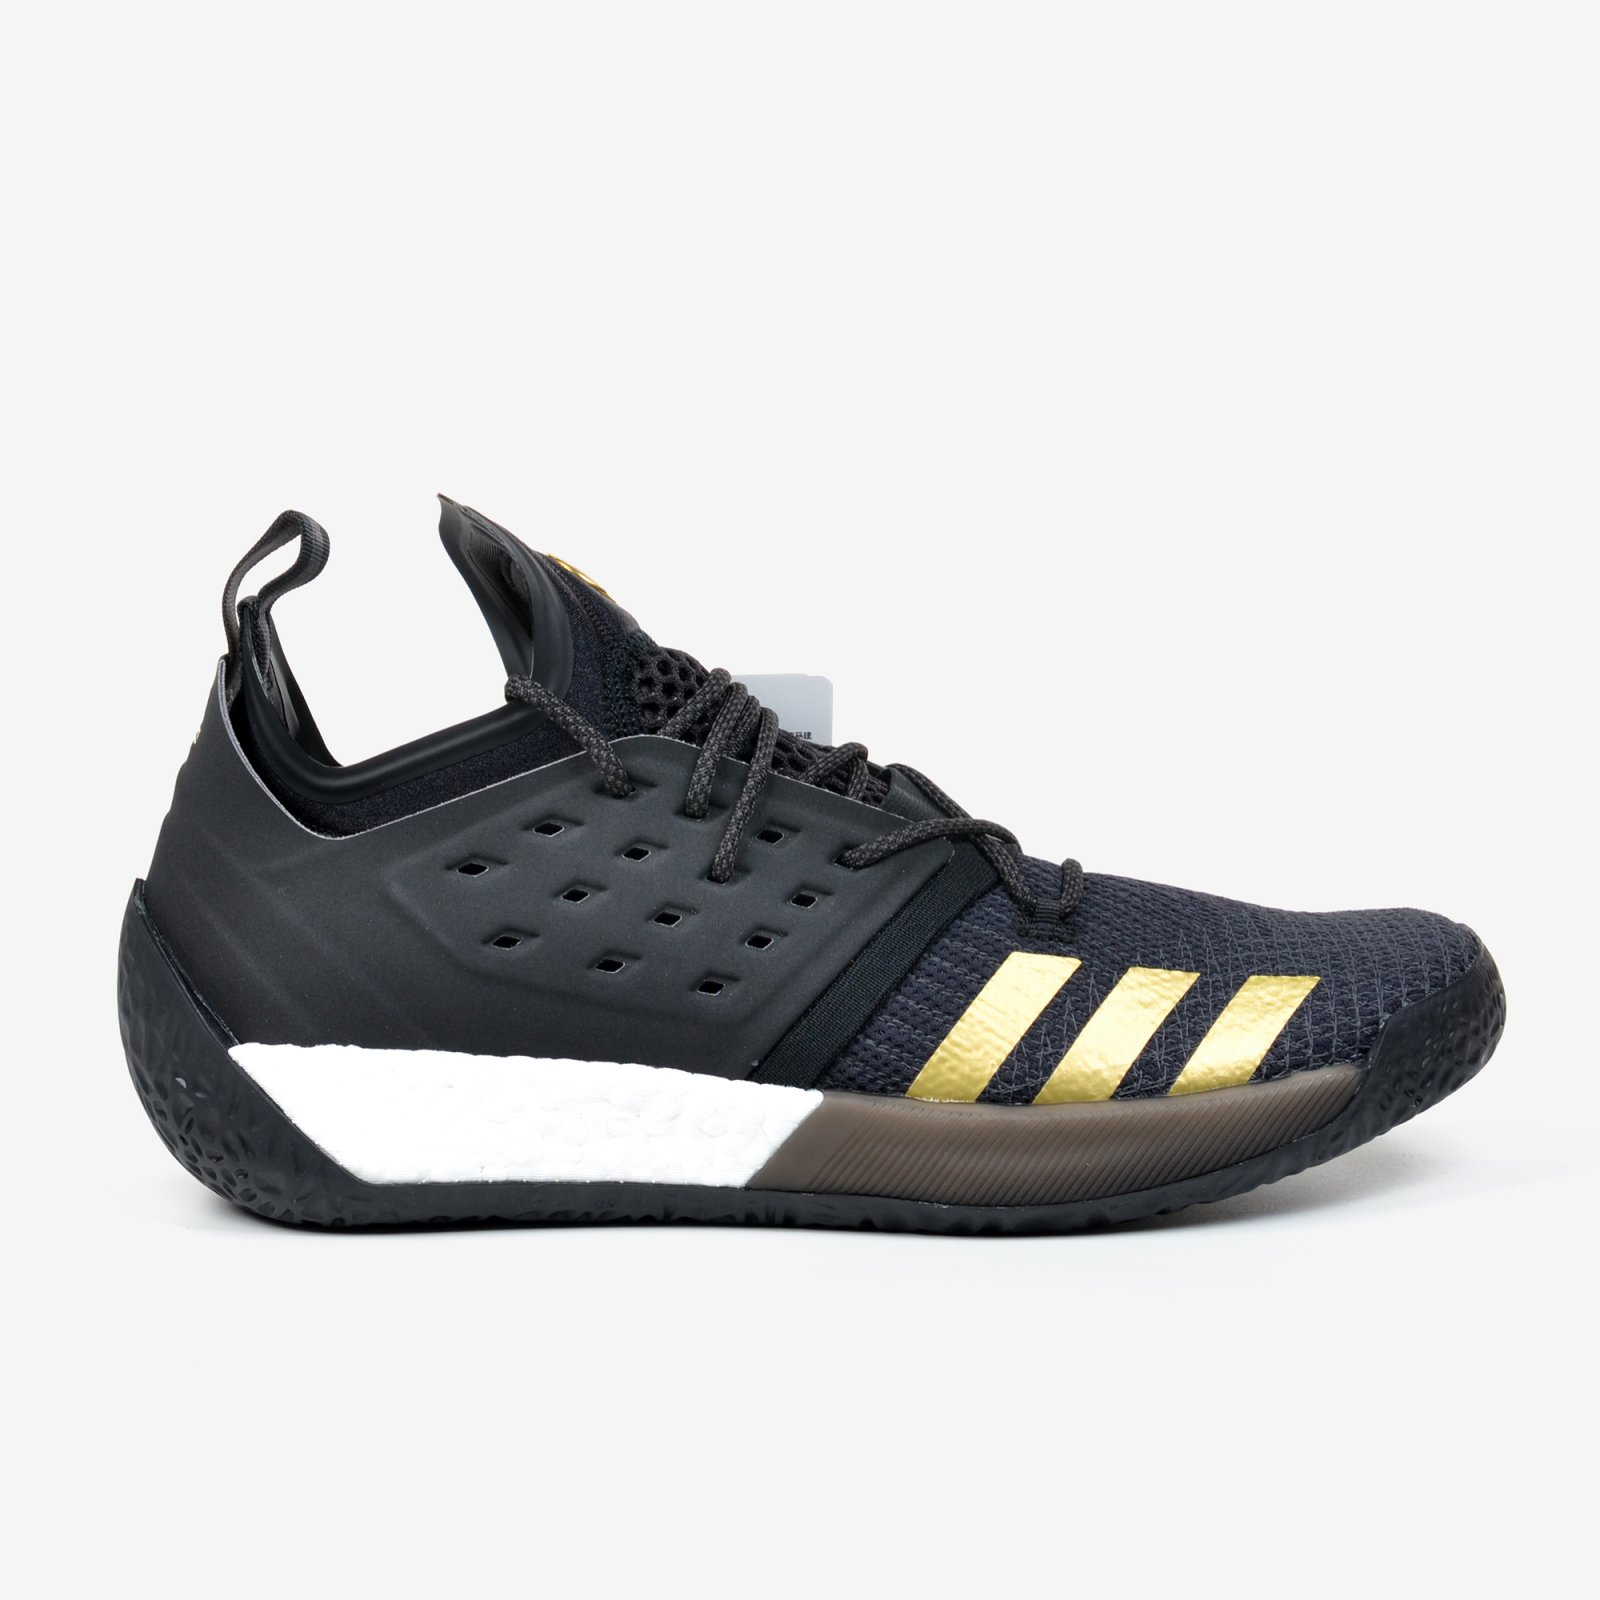 1b2b1fb8cef803 Details about Adidas Harden Vol. 2 Imma Be a Star Black Gold Basketball  Shoes Primeknit AH2215